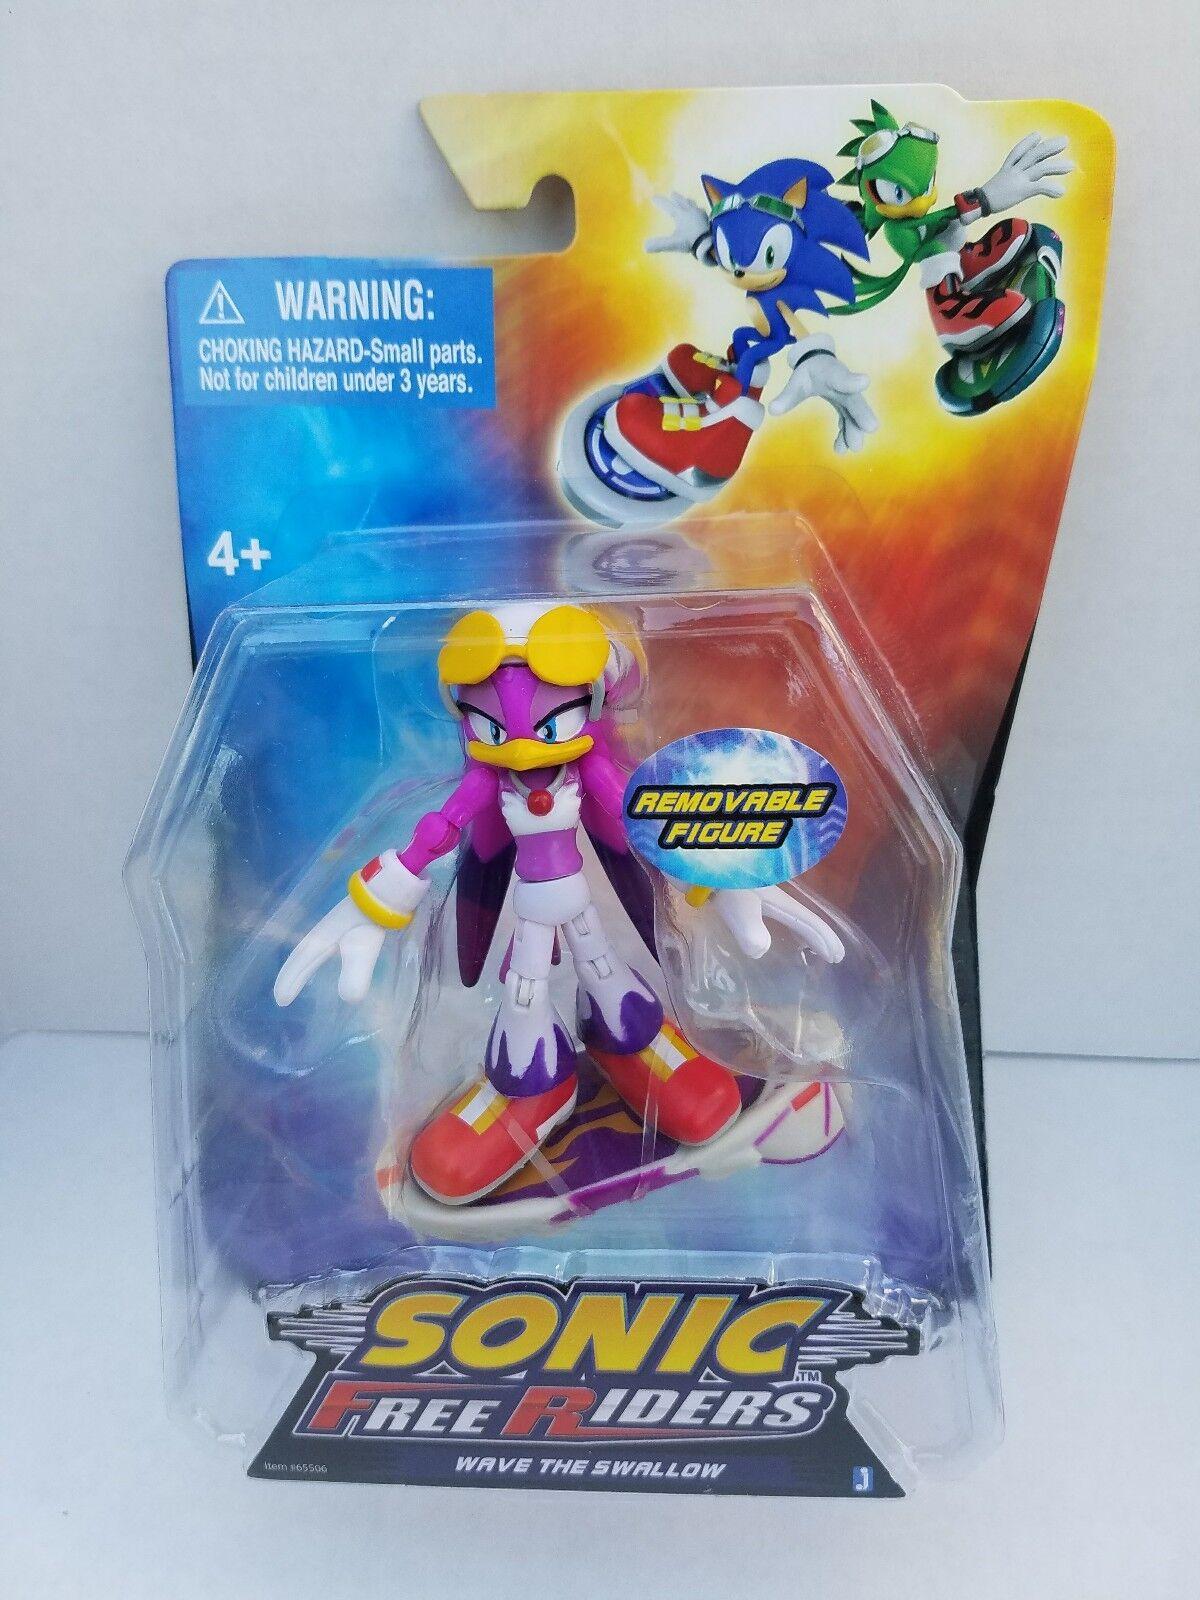 Sonic Free Rider Raro Jazwares onda el tragar Juguete